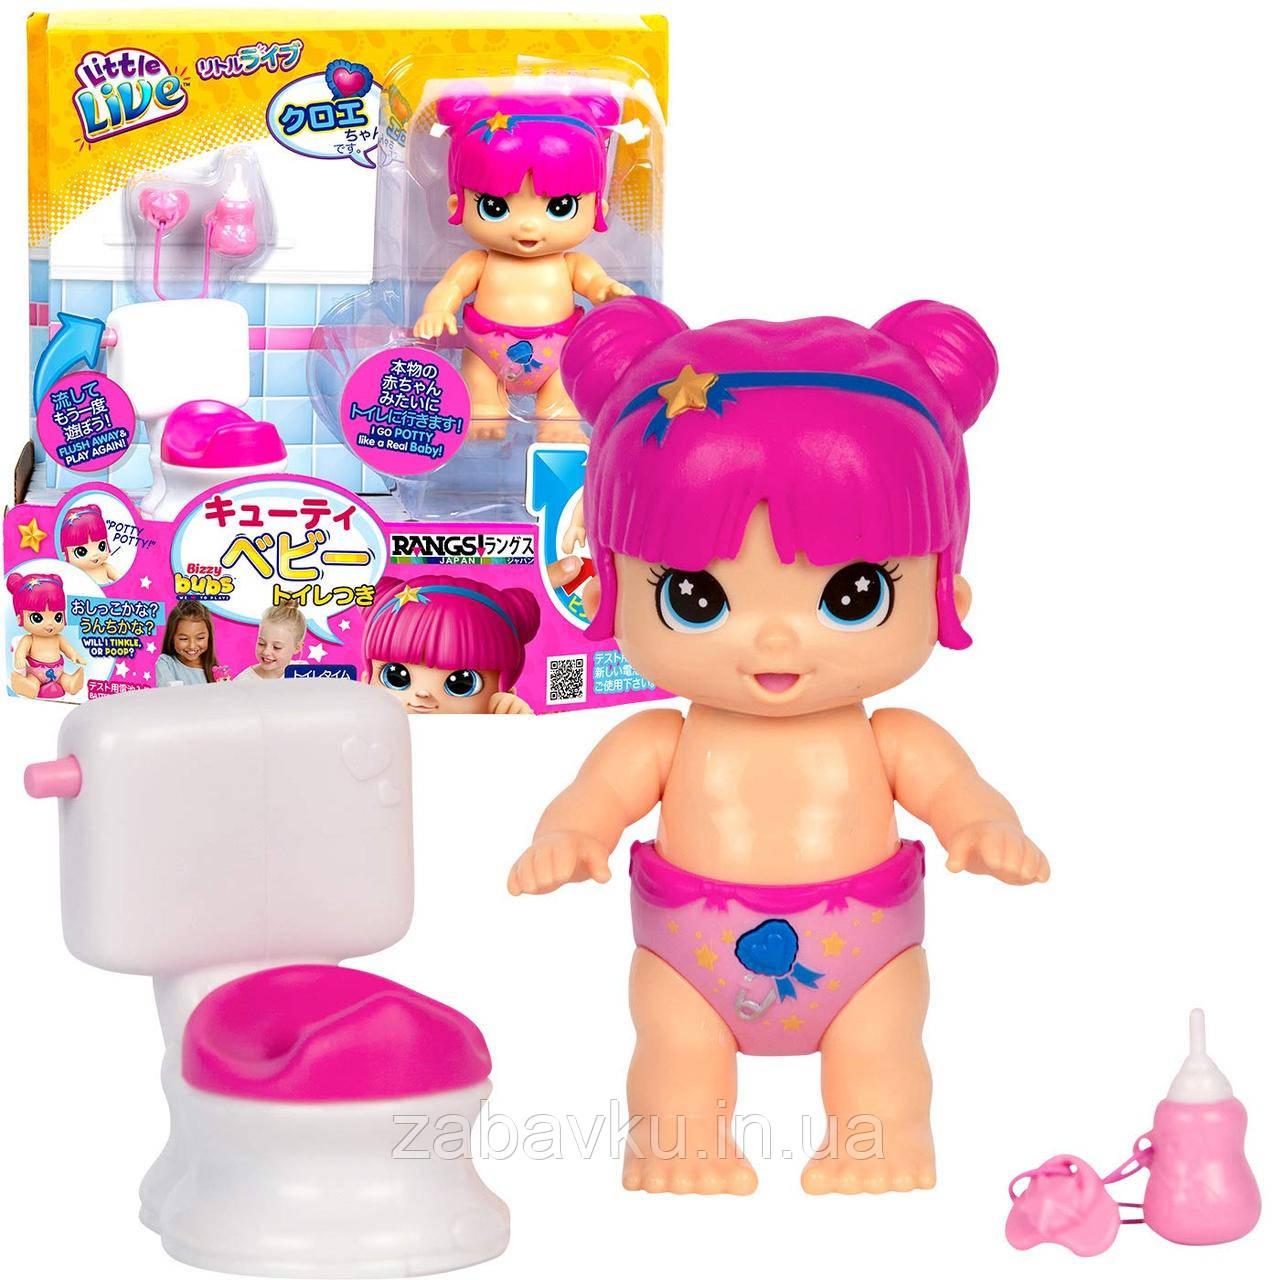 Little Live Bizzy Bubs Clever Chloe Potty Time Інтерактивний пупс Бізі Бабс